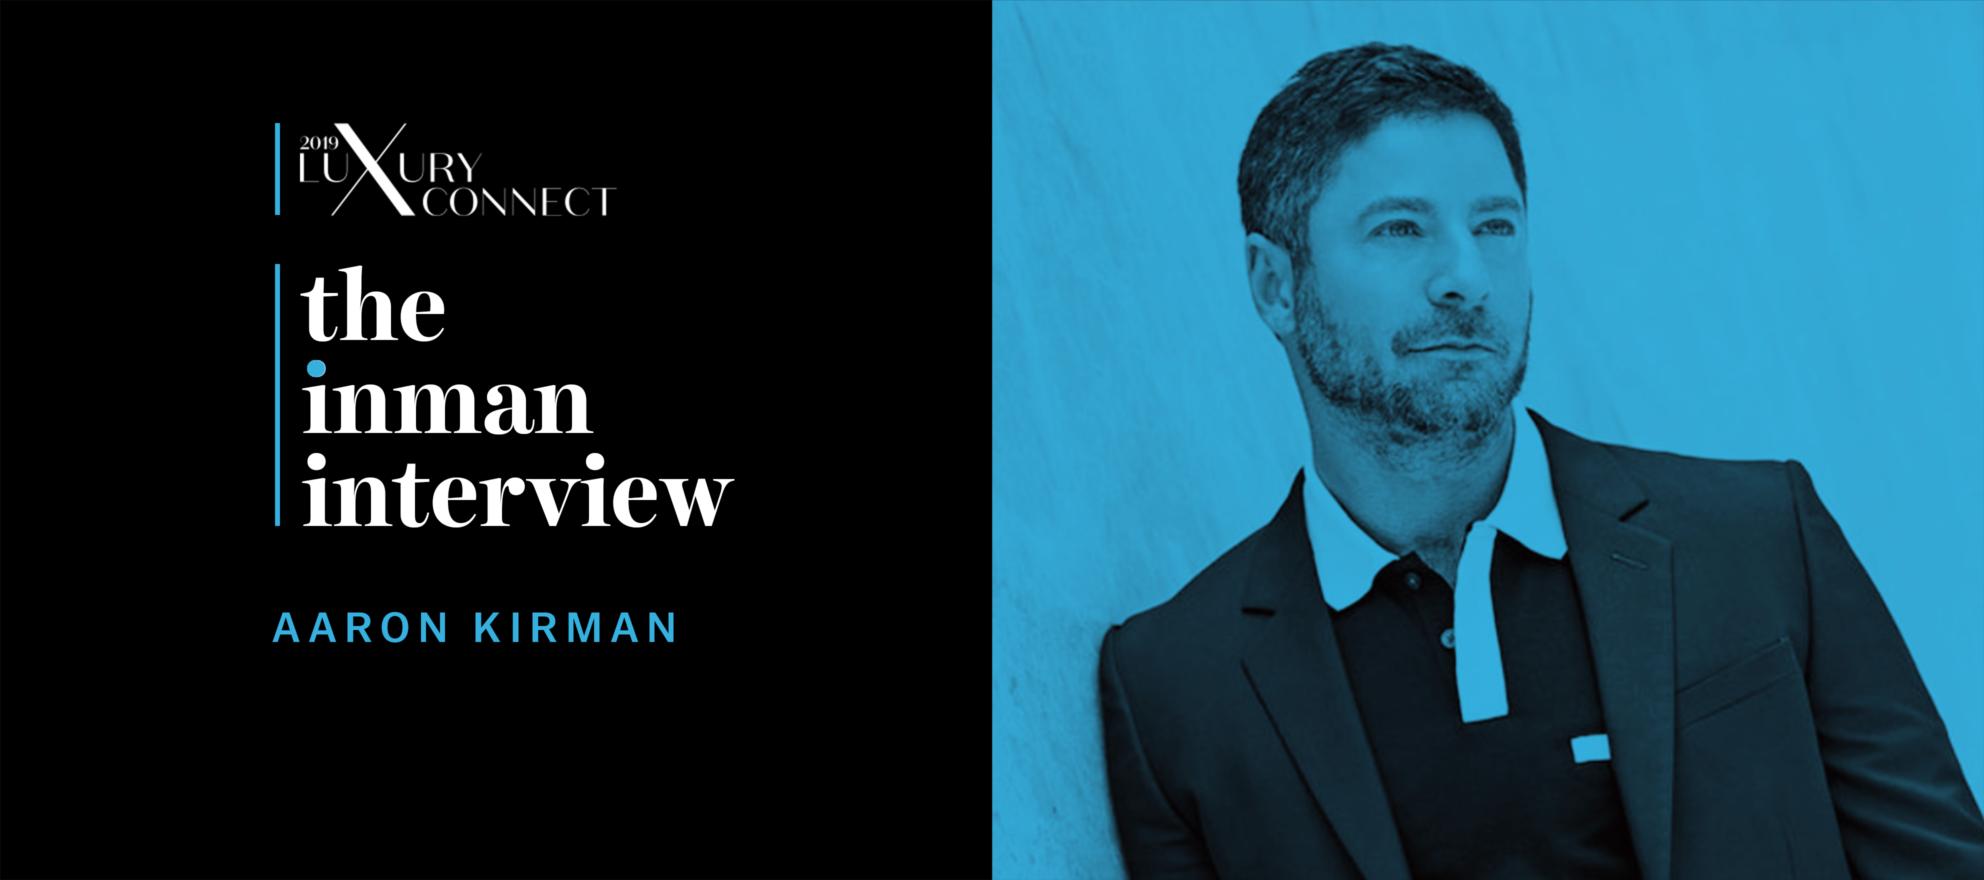 'Listing Impossible' star Aaron Kirman on breaking into luxury